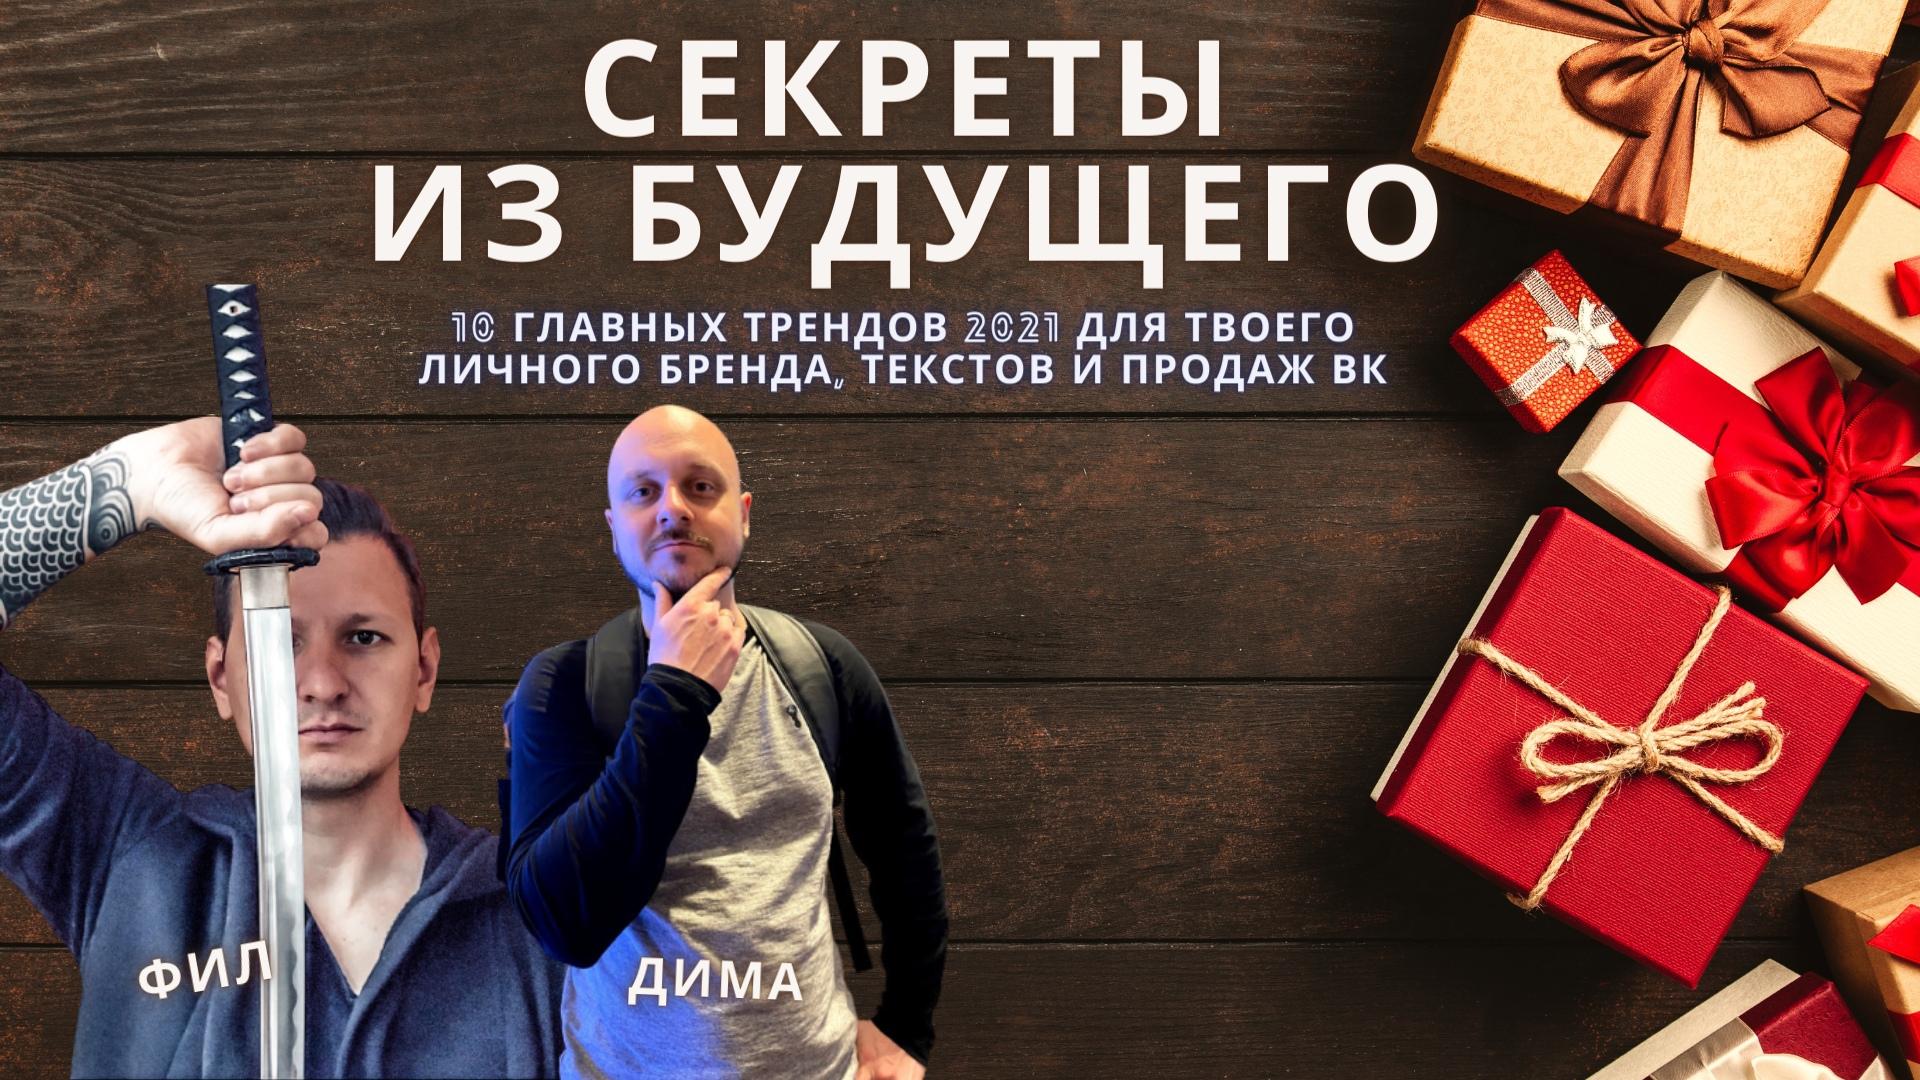 E7KbLWQ8F50 [Дмитрий Коренко] Секреты из будущего